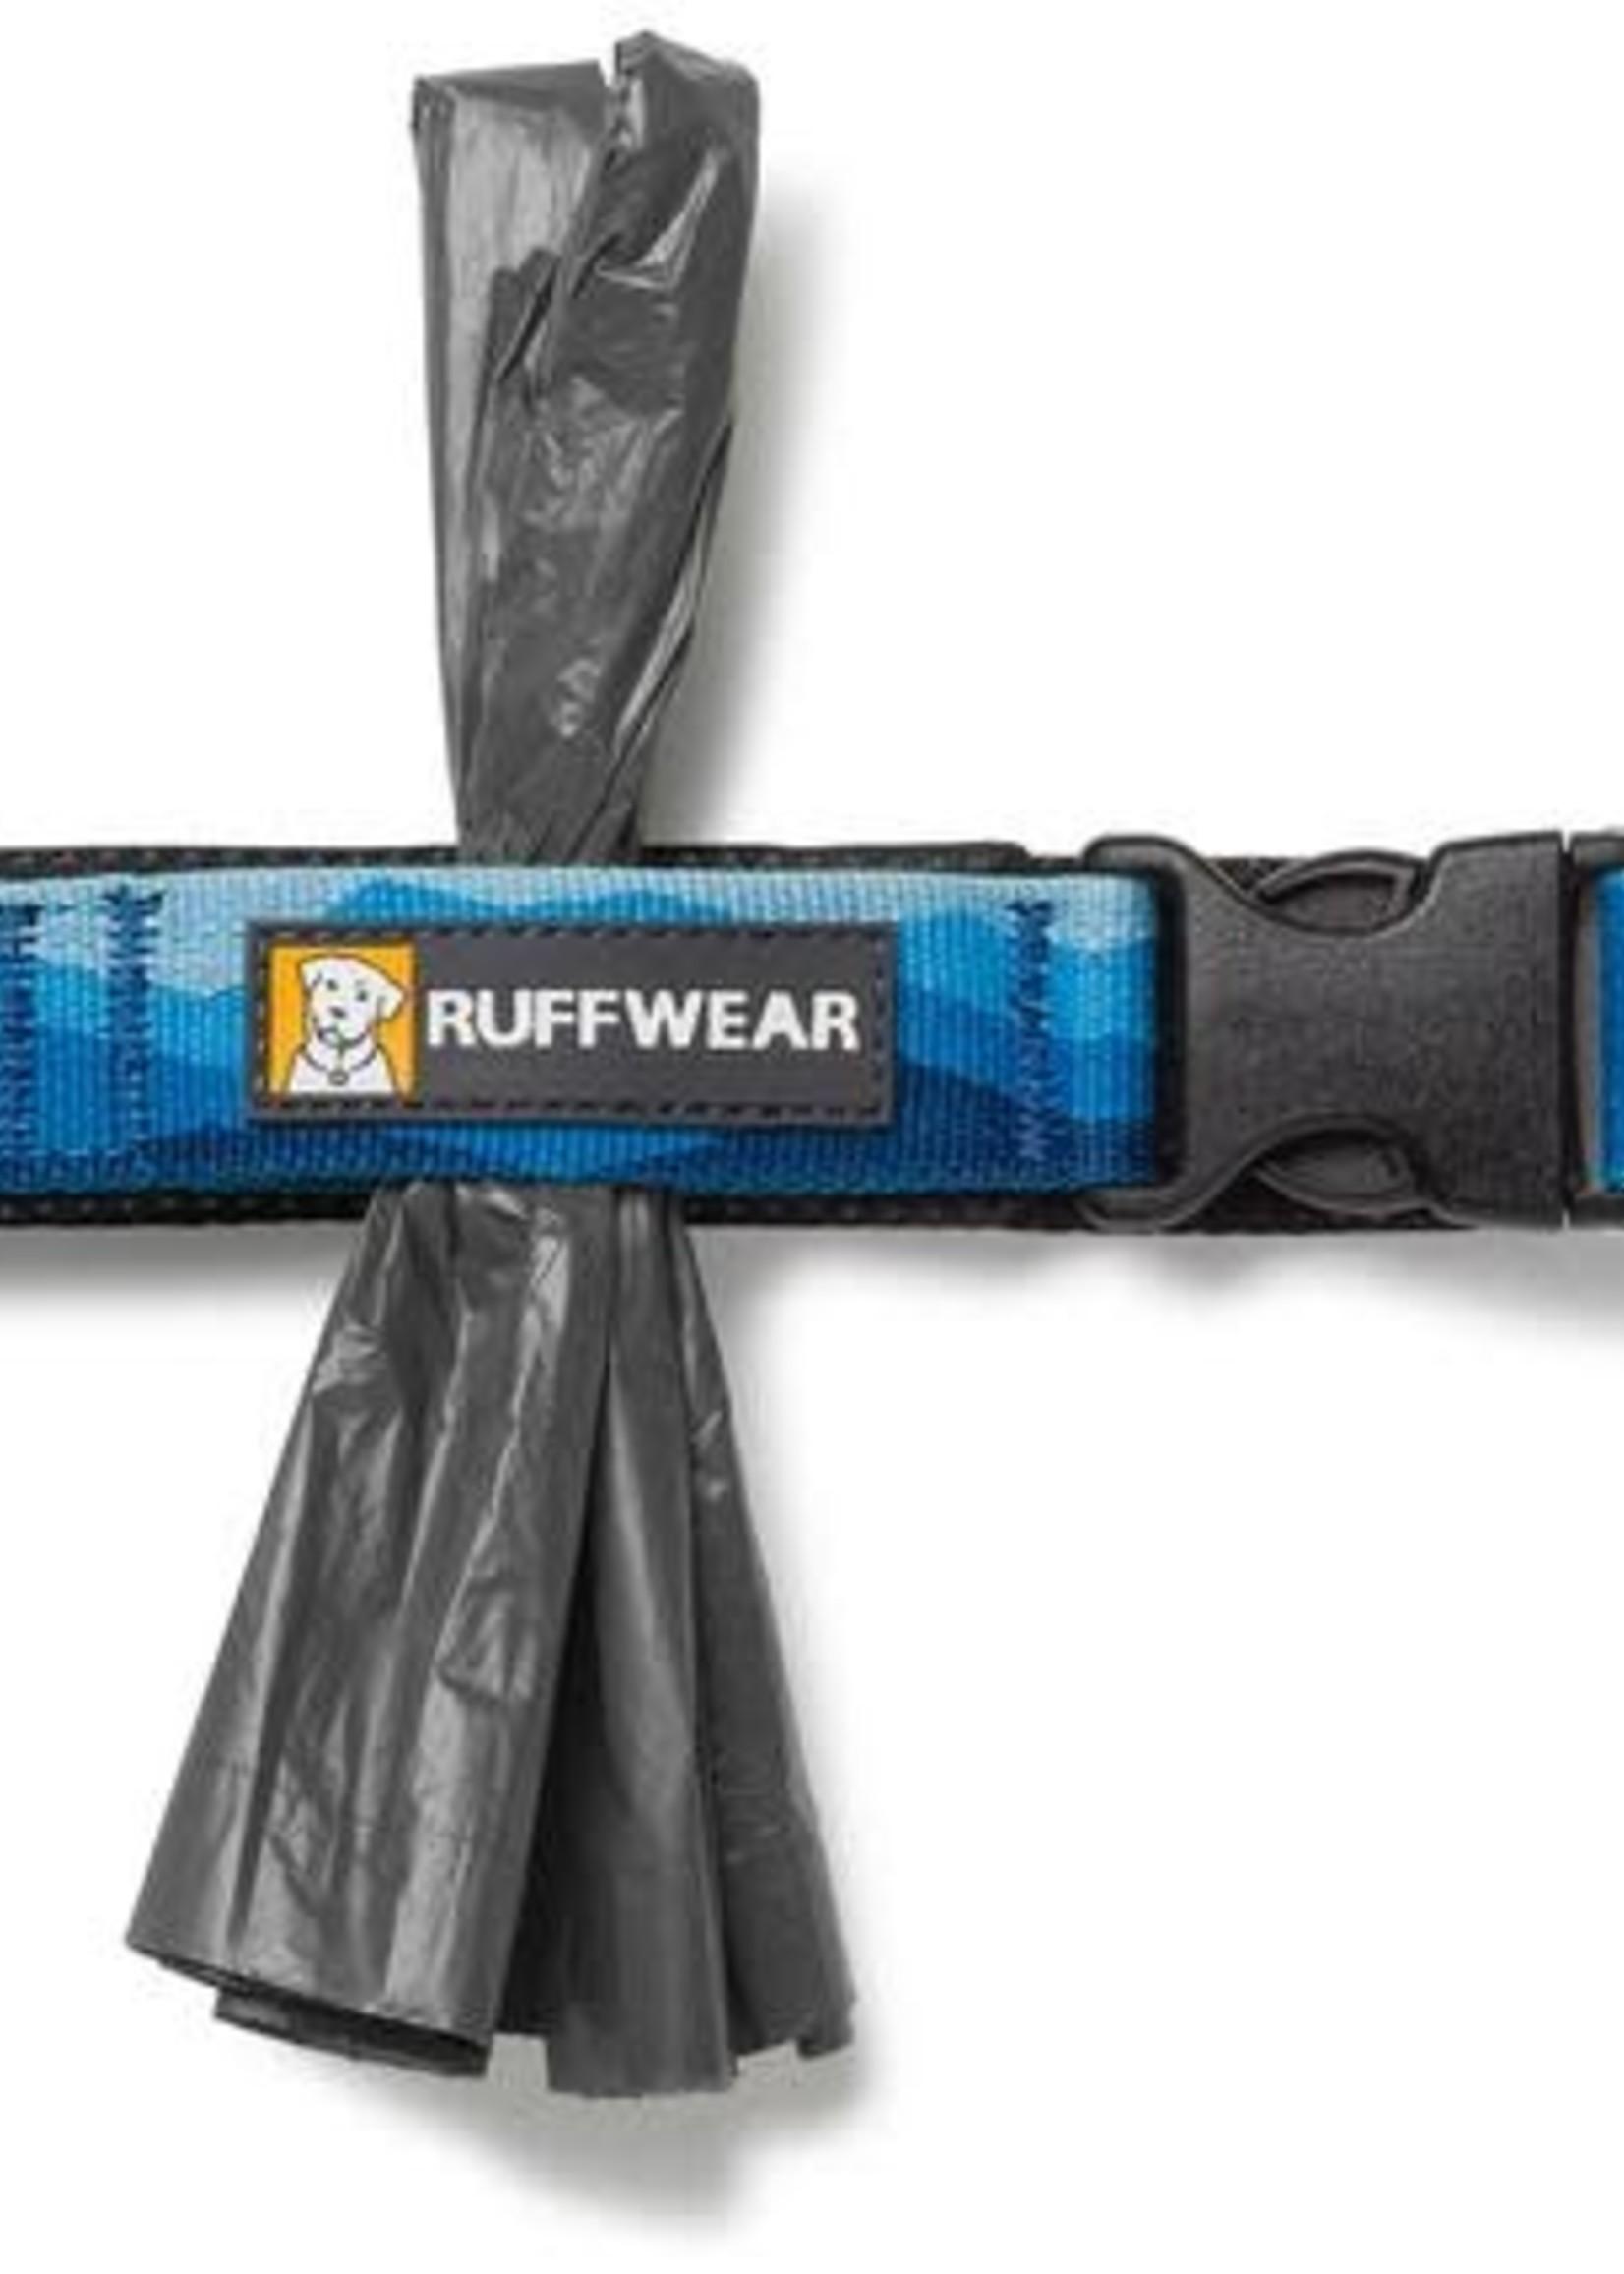 Ruffwear RuffWear Flat Out Leash